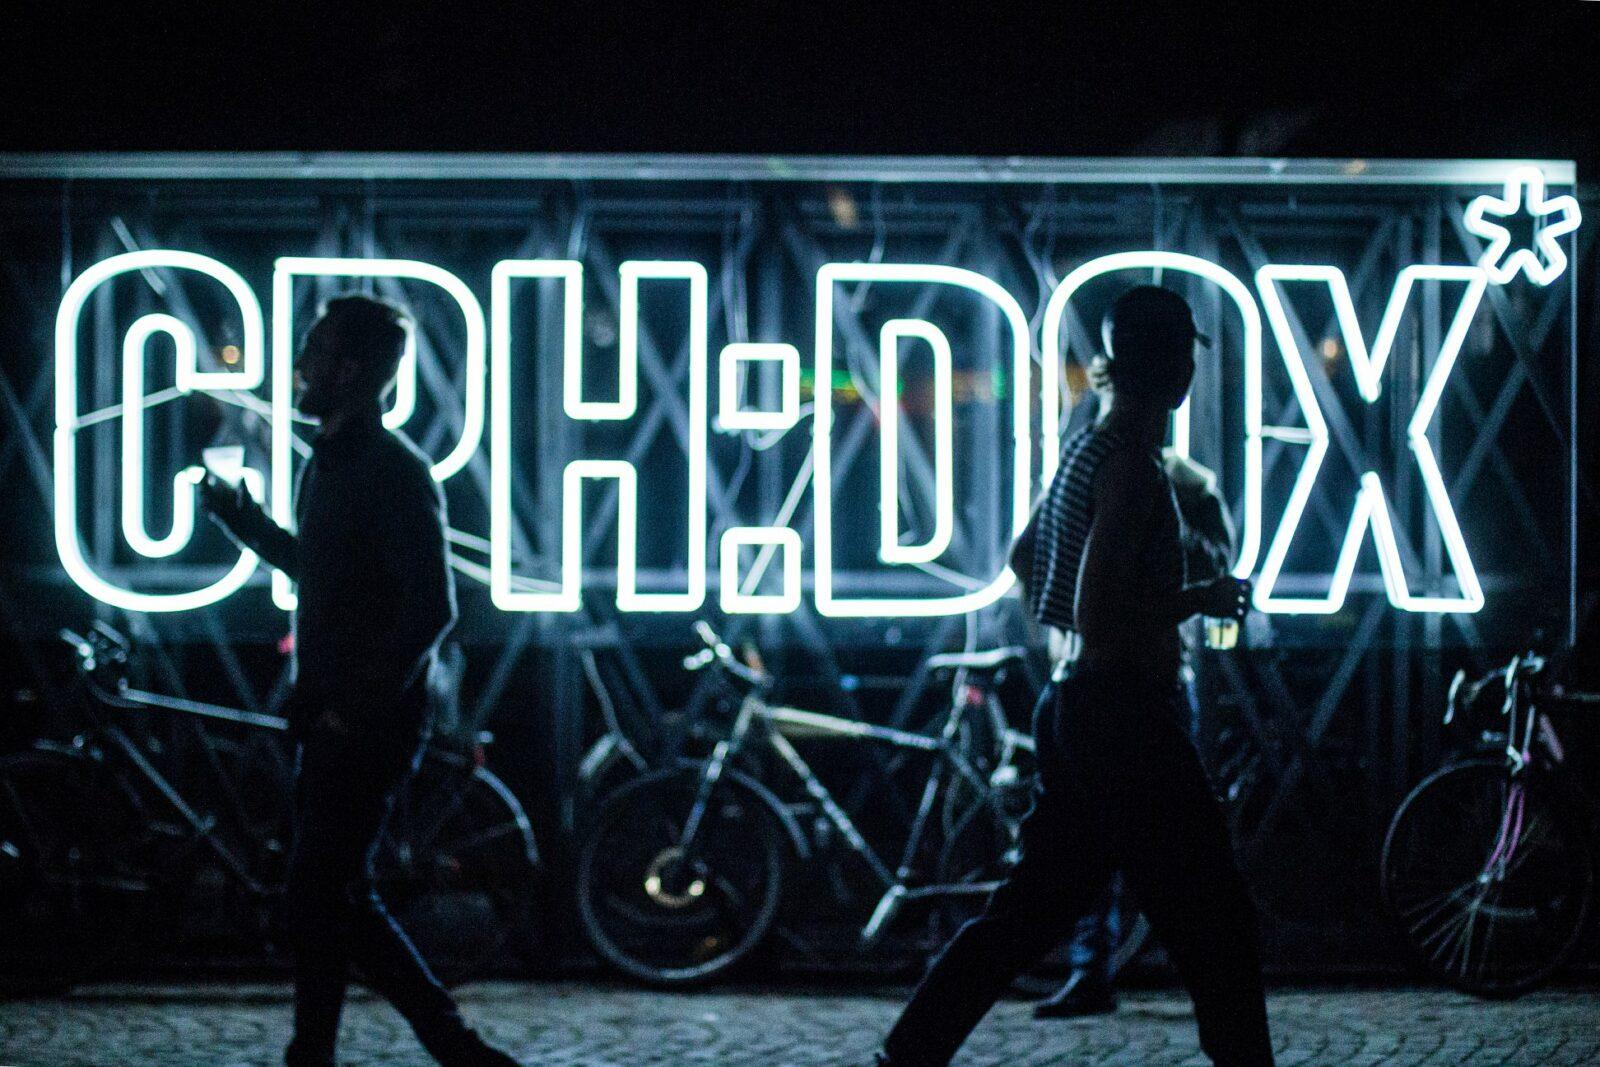 CPH:DOX neon sign